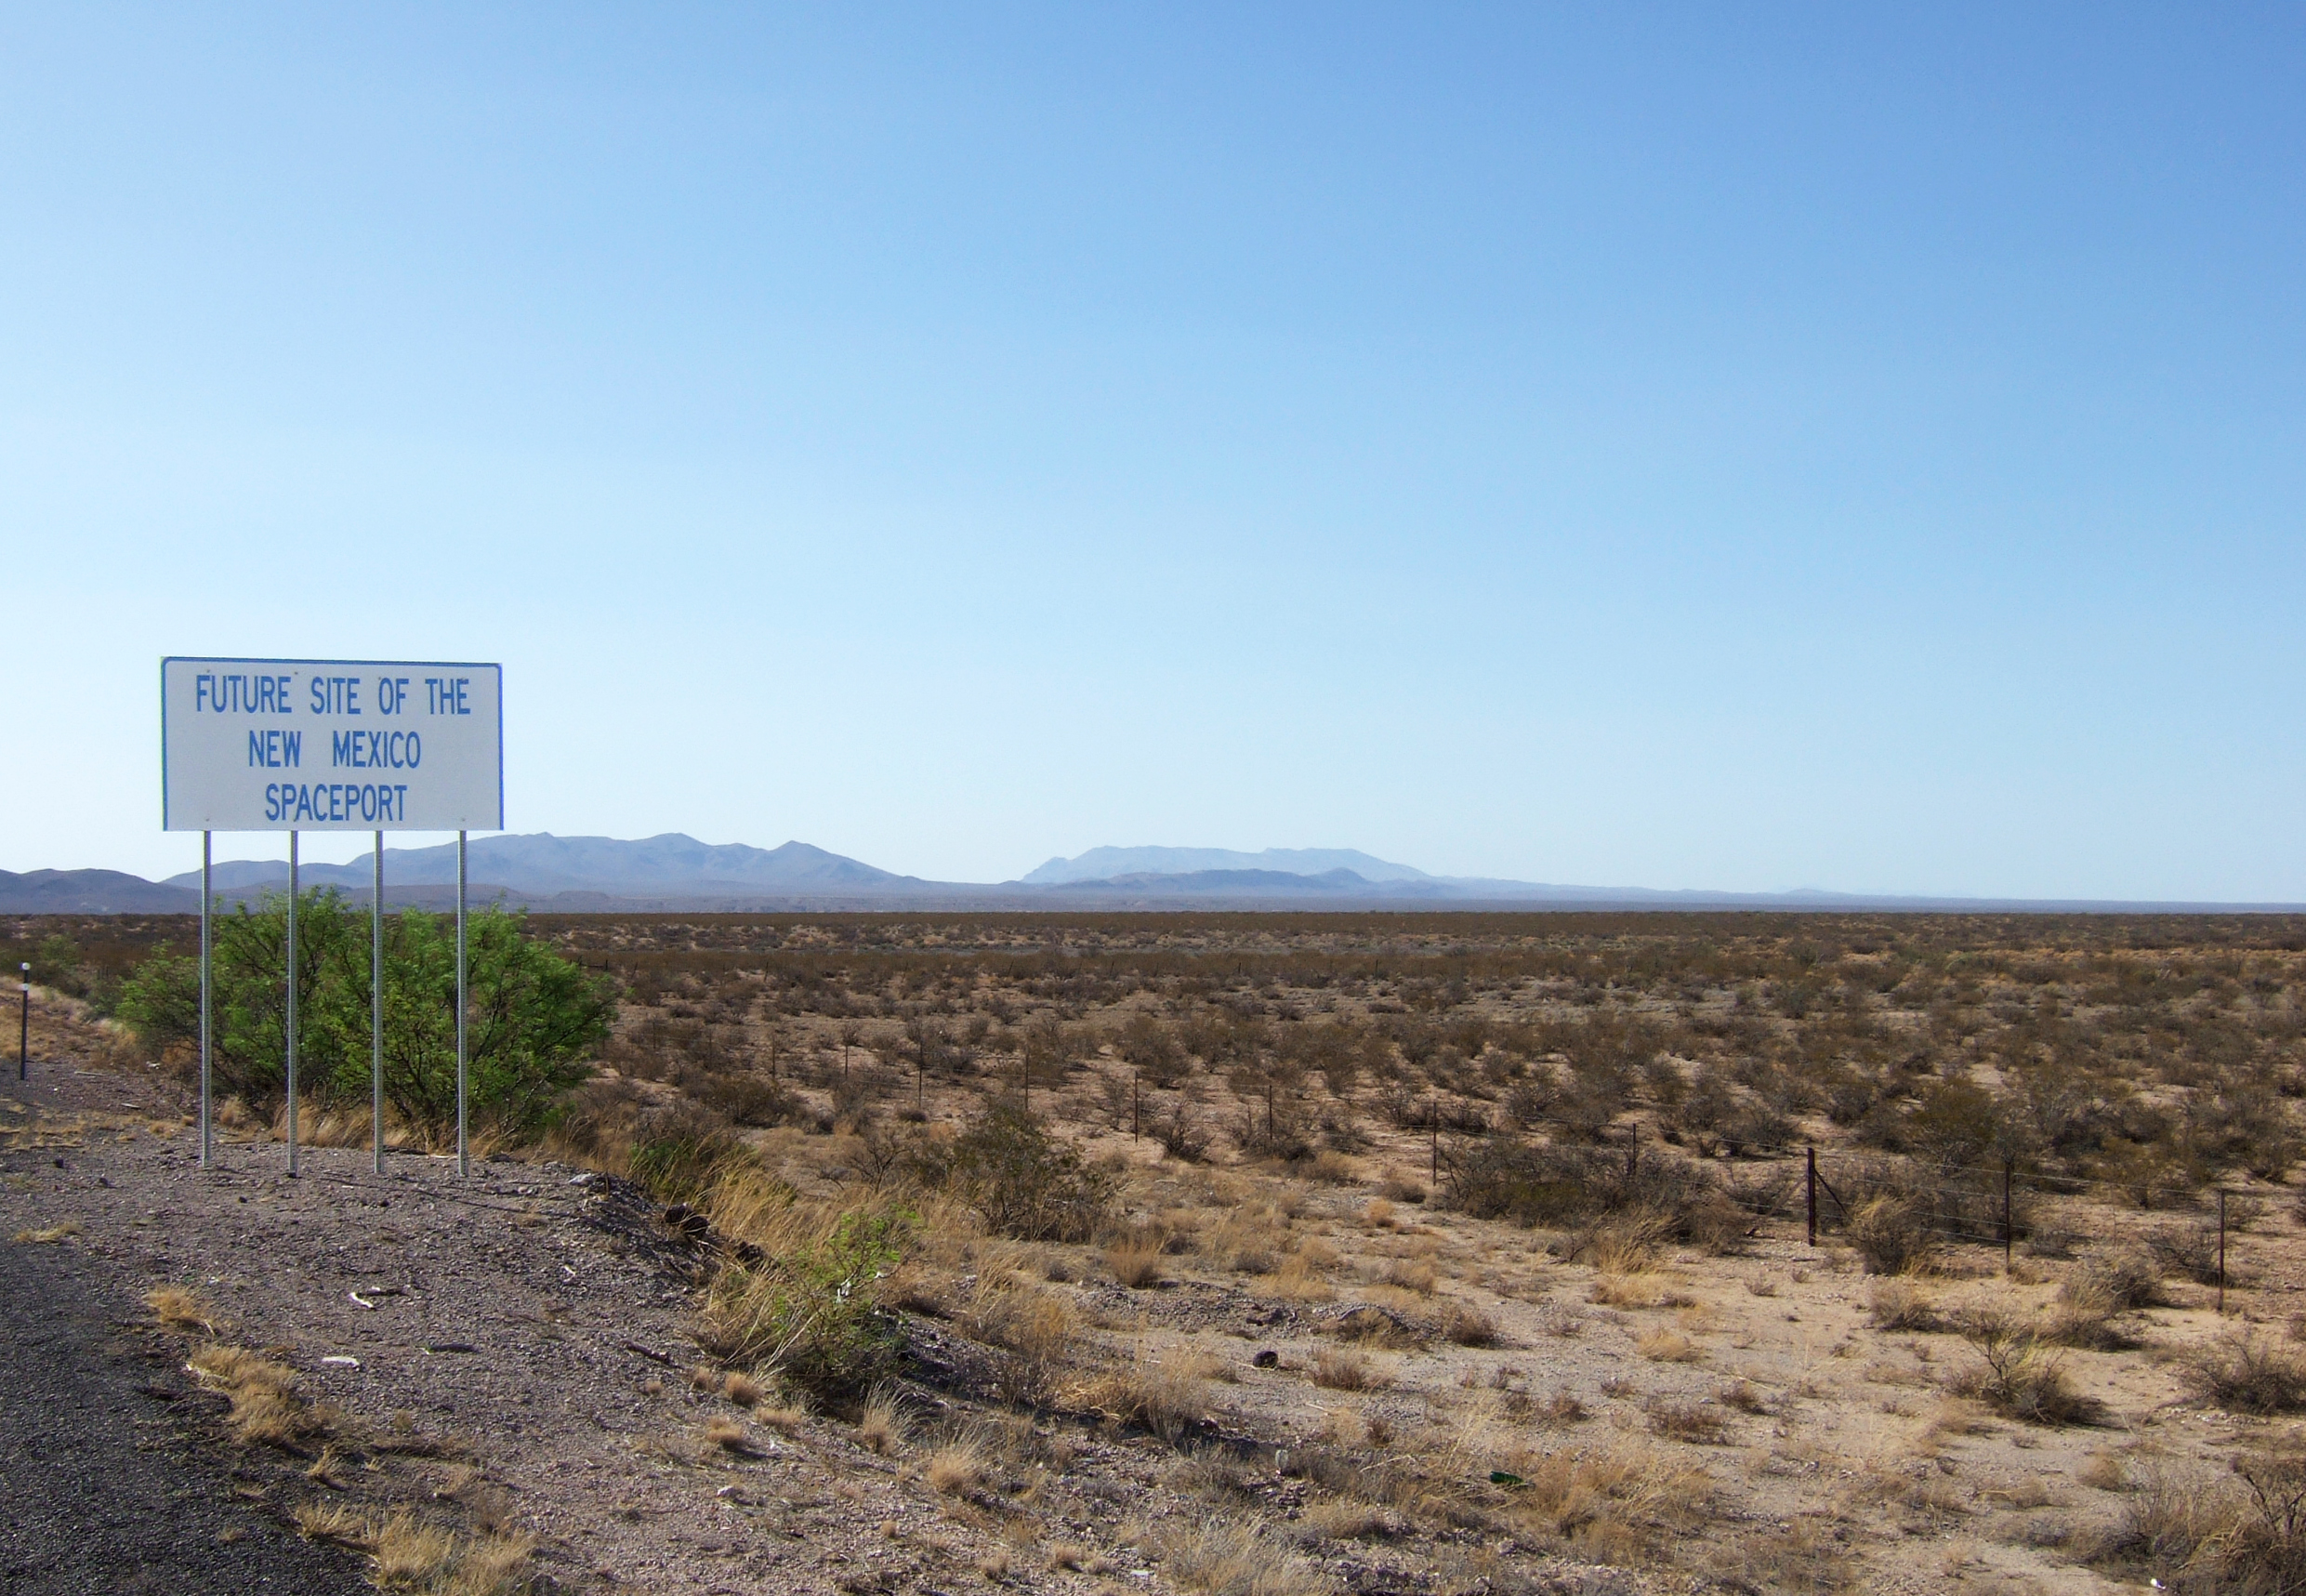 New Mexico - Wikipedianew mexico